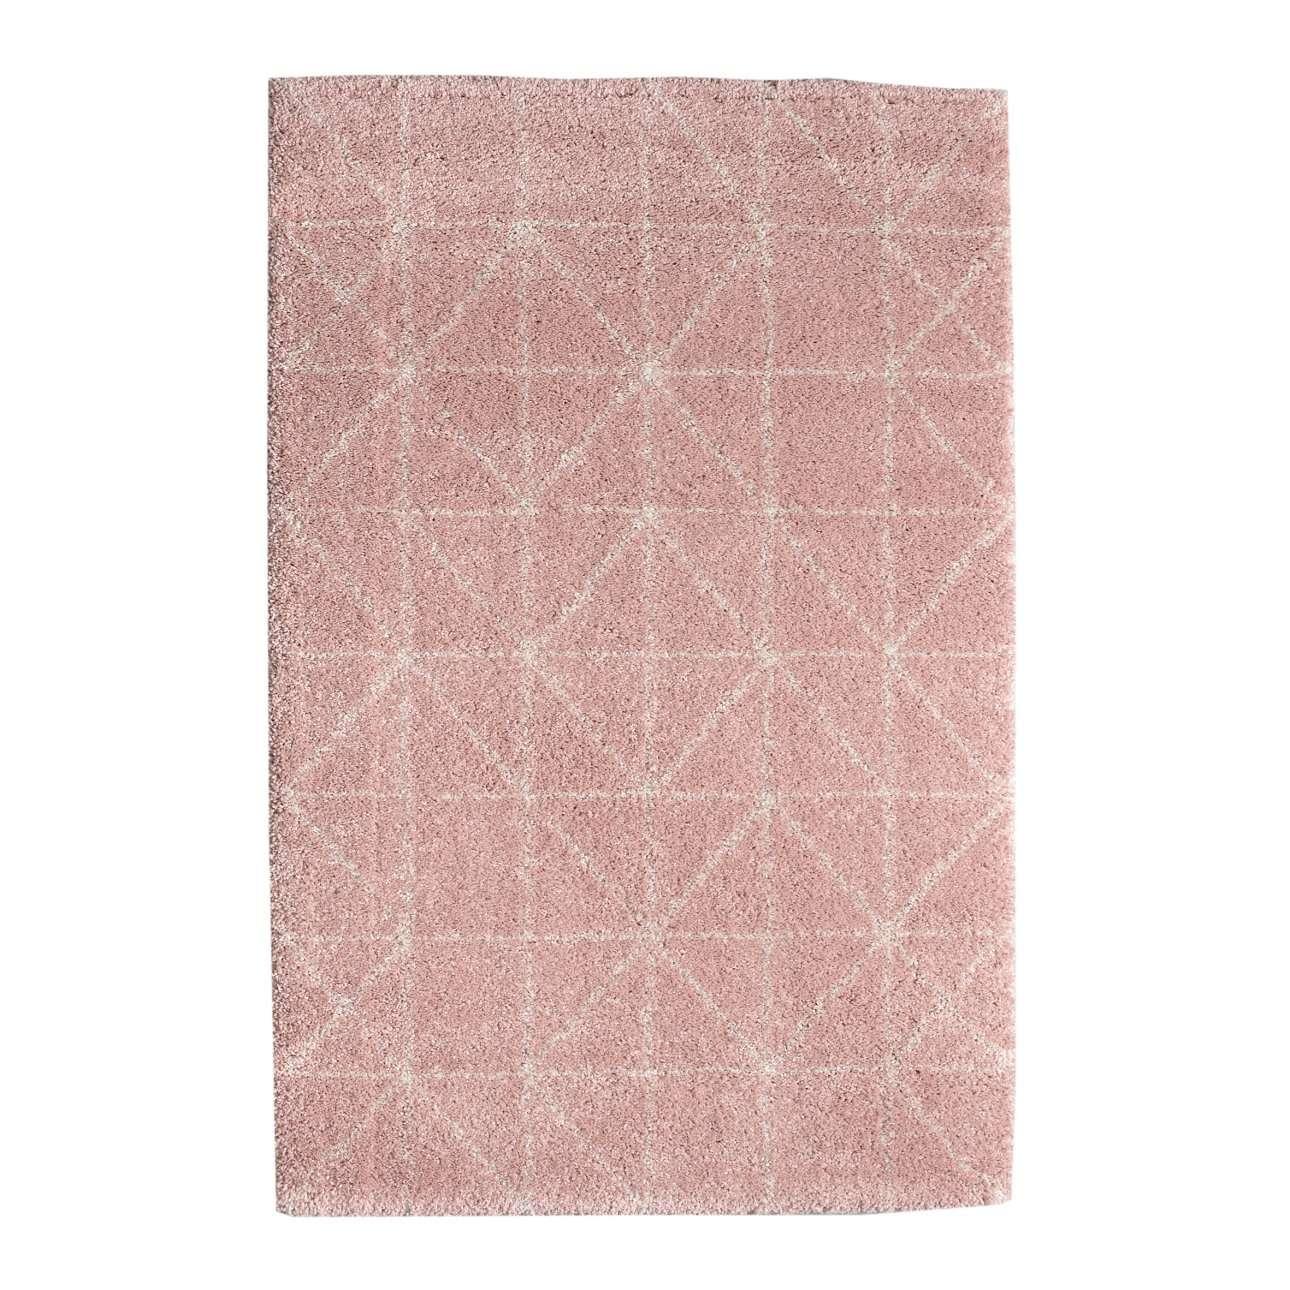 Teppich Royal Nomadic Living rose/cream 120x170cm